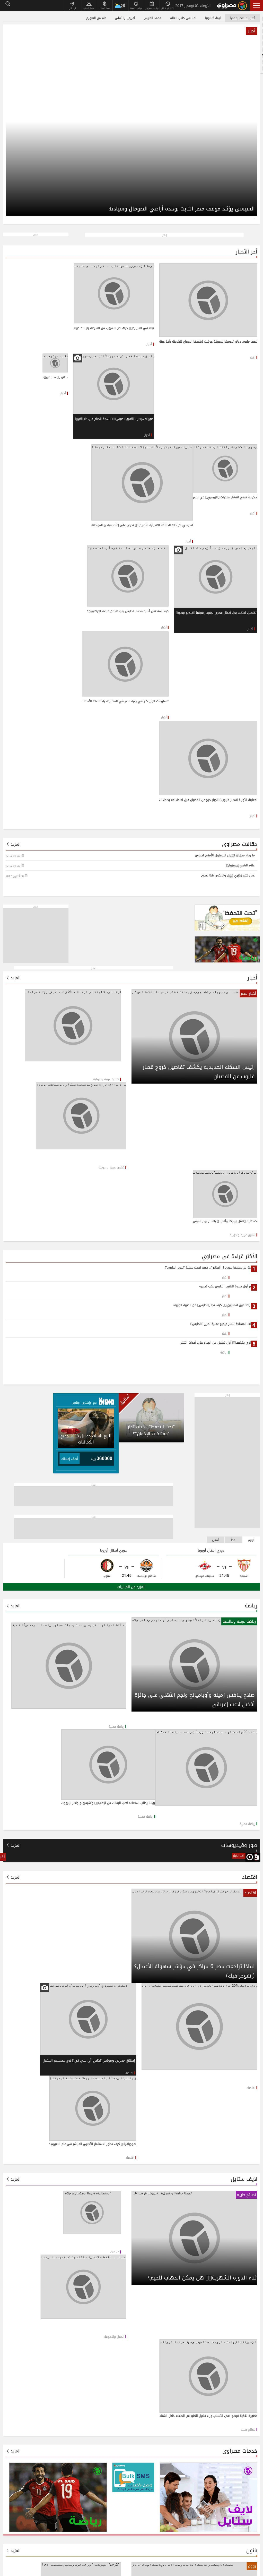 Masrawy at Wednesday Nov. 1, 2017, 4:10 p.m. UTC